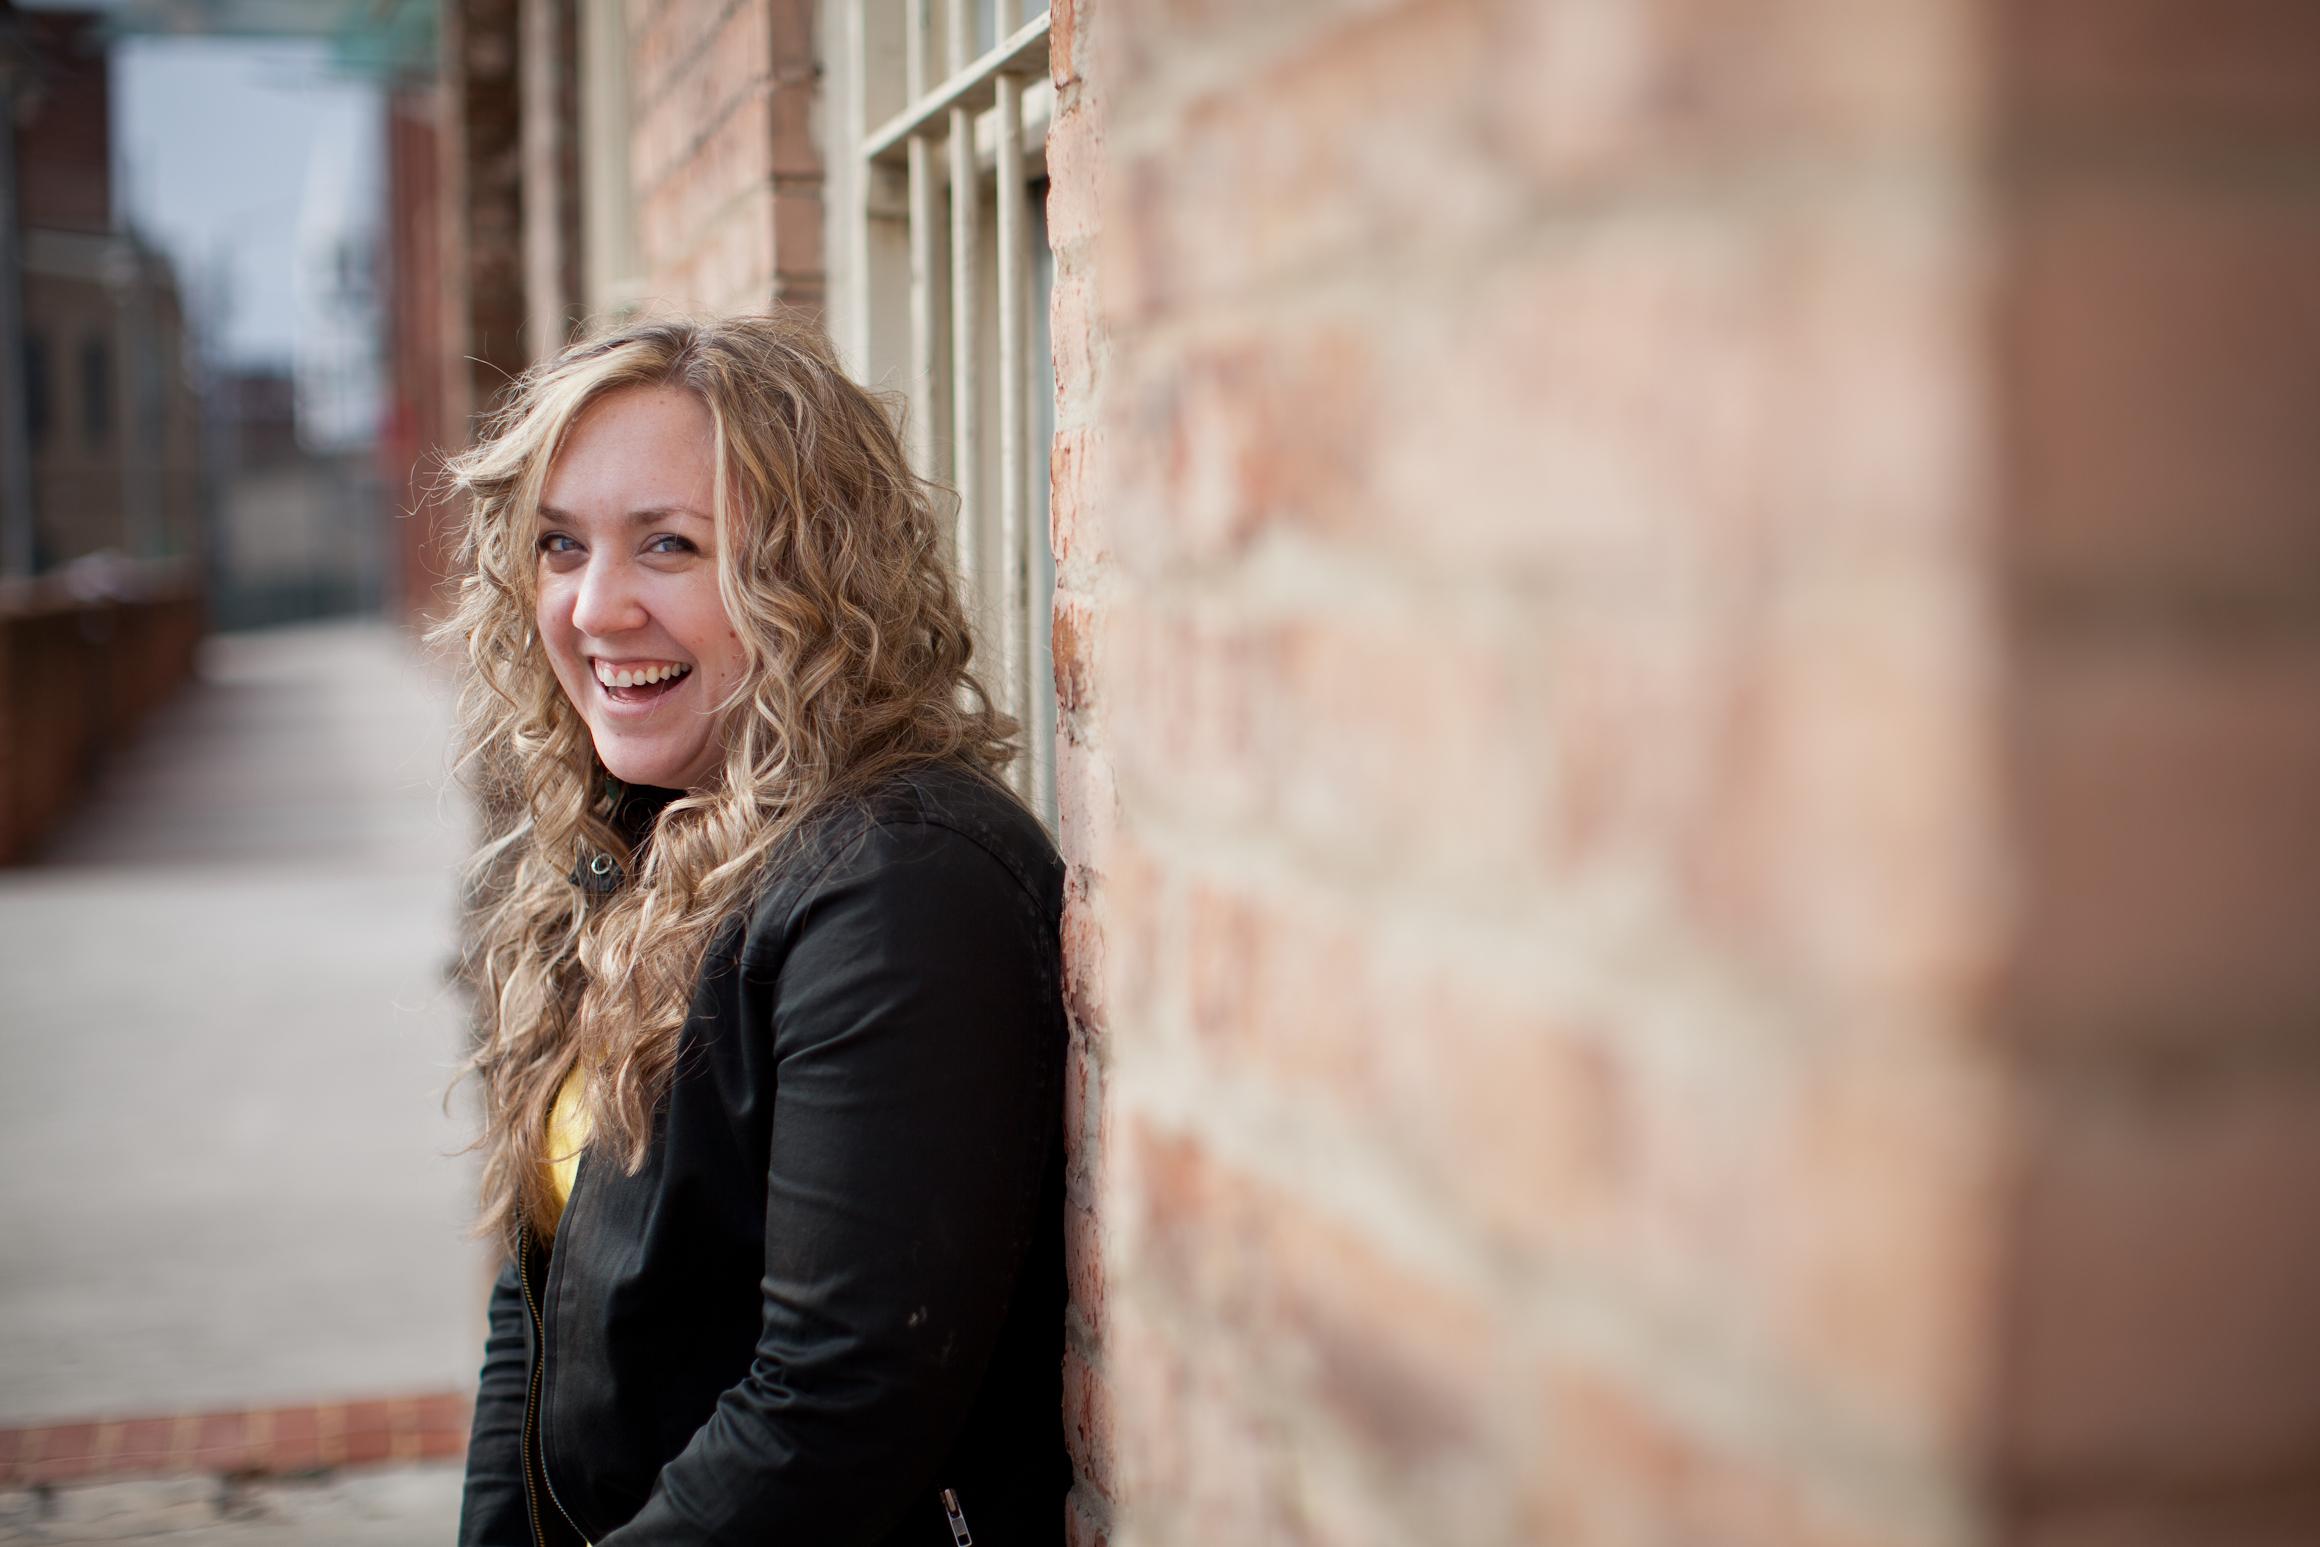 Amy Cox Photo Shoot Roanoke Laugh.jpg